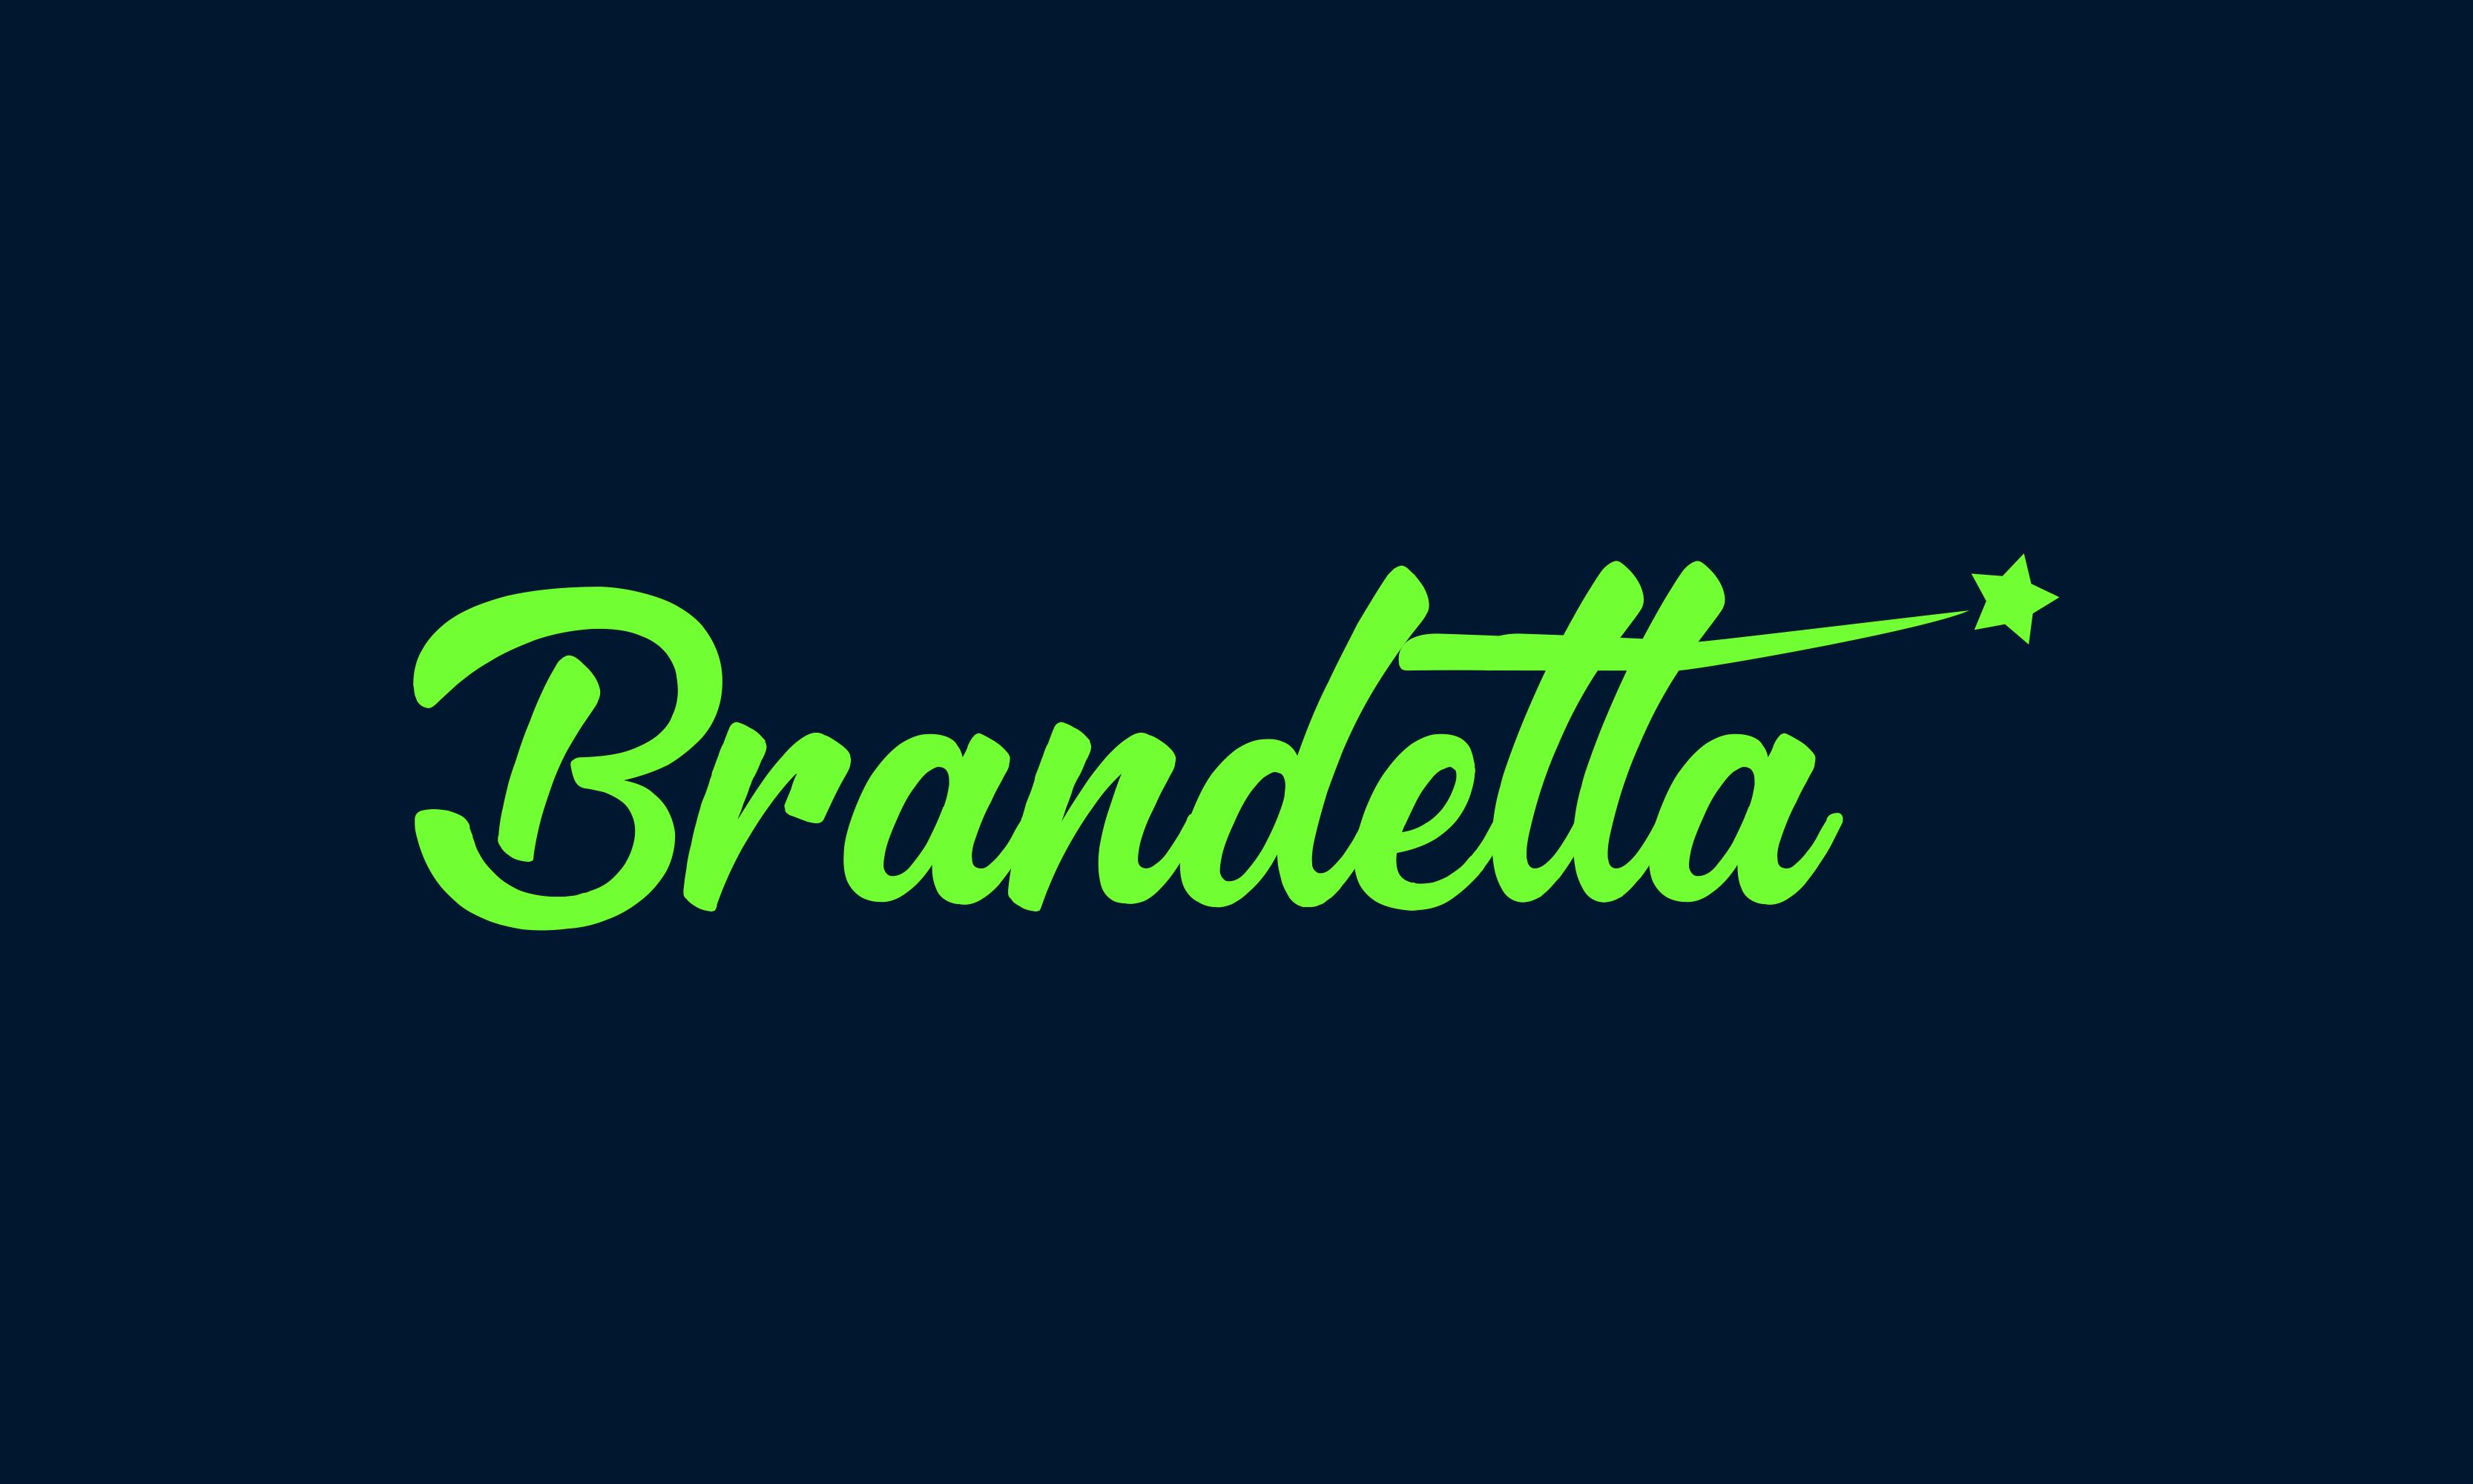 Brandetta